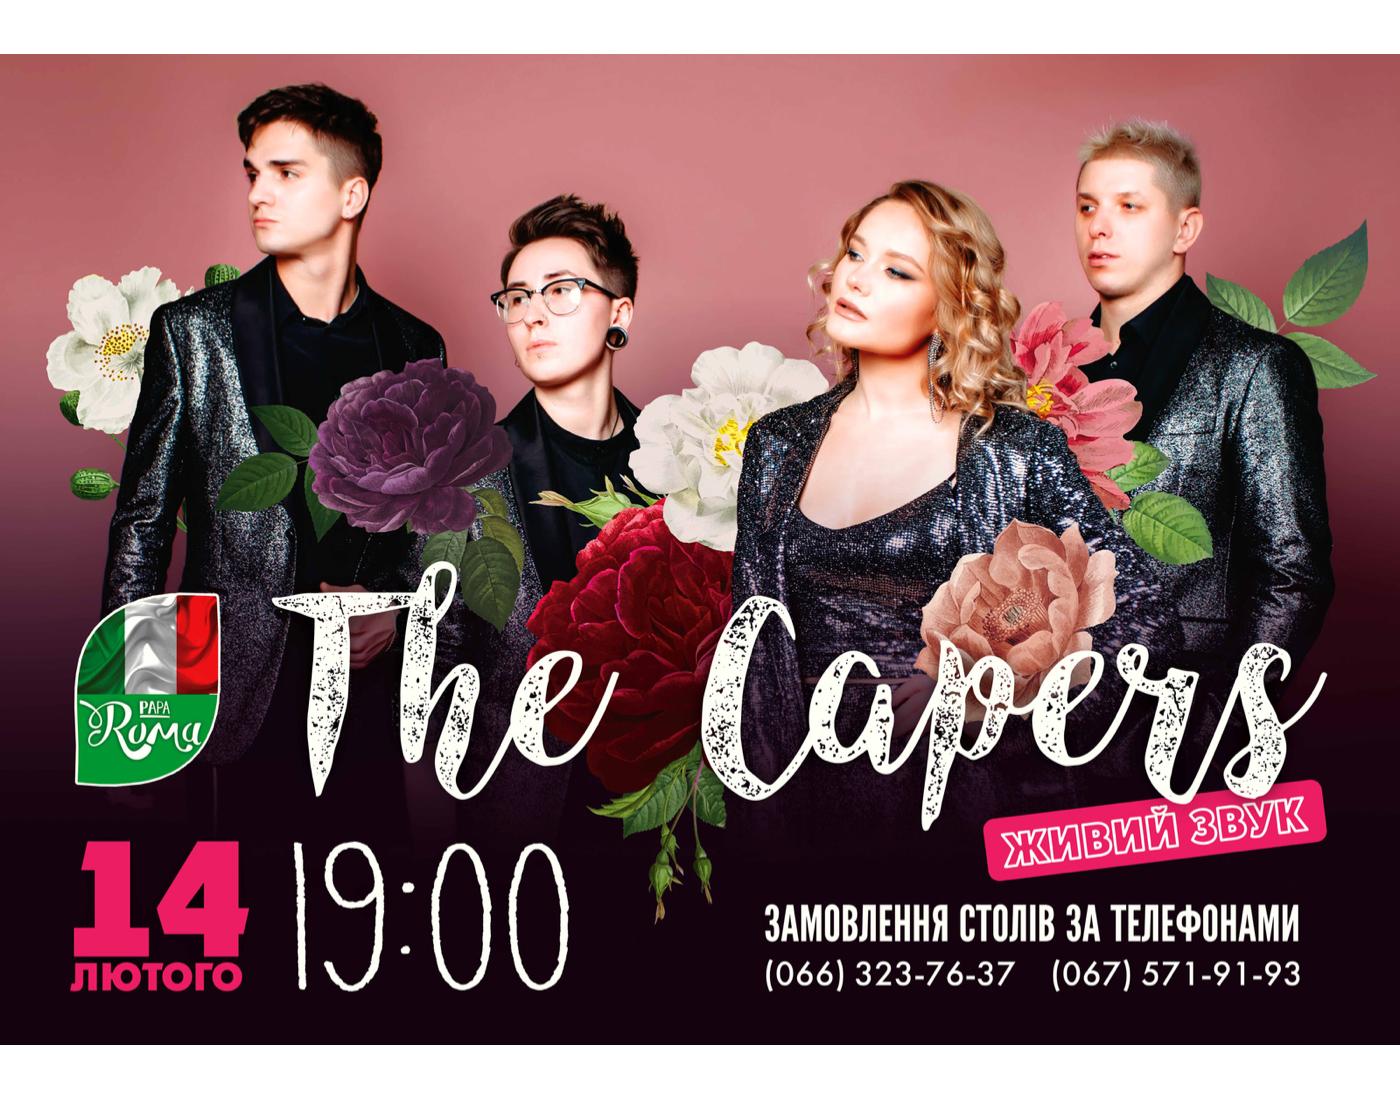 Концерт гурту The Capers 14 лютого о 19:00